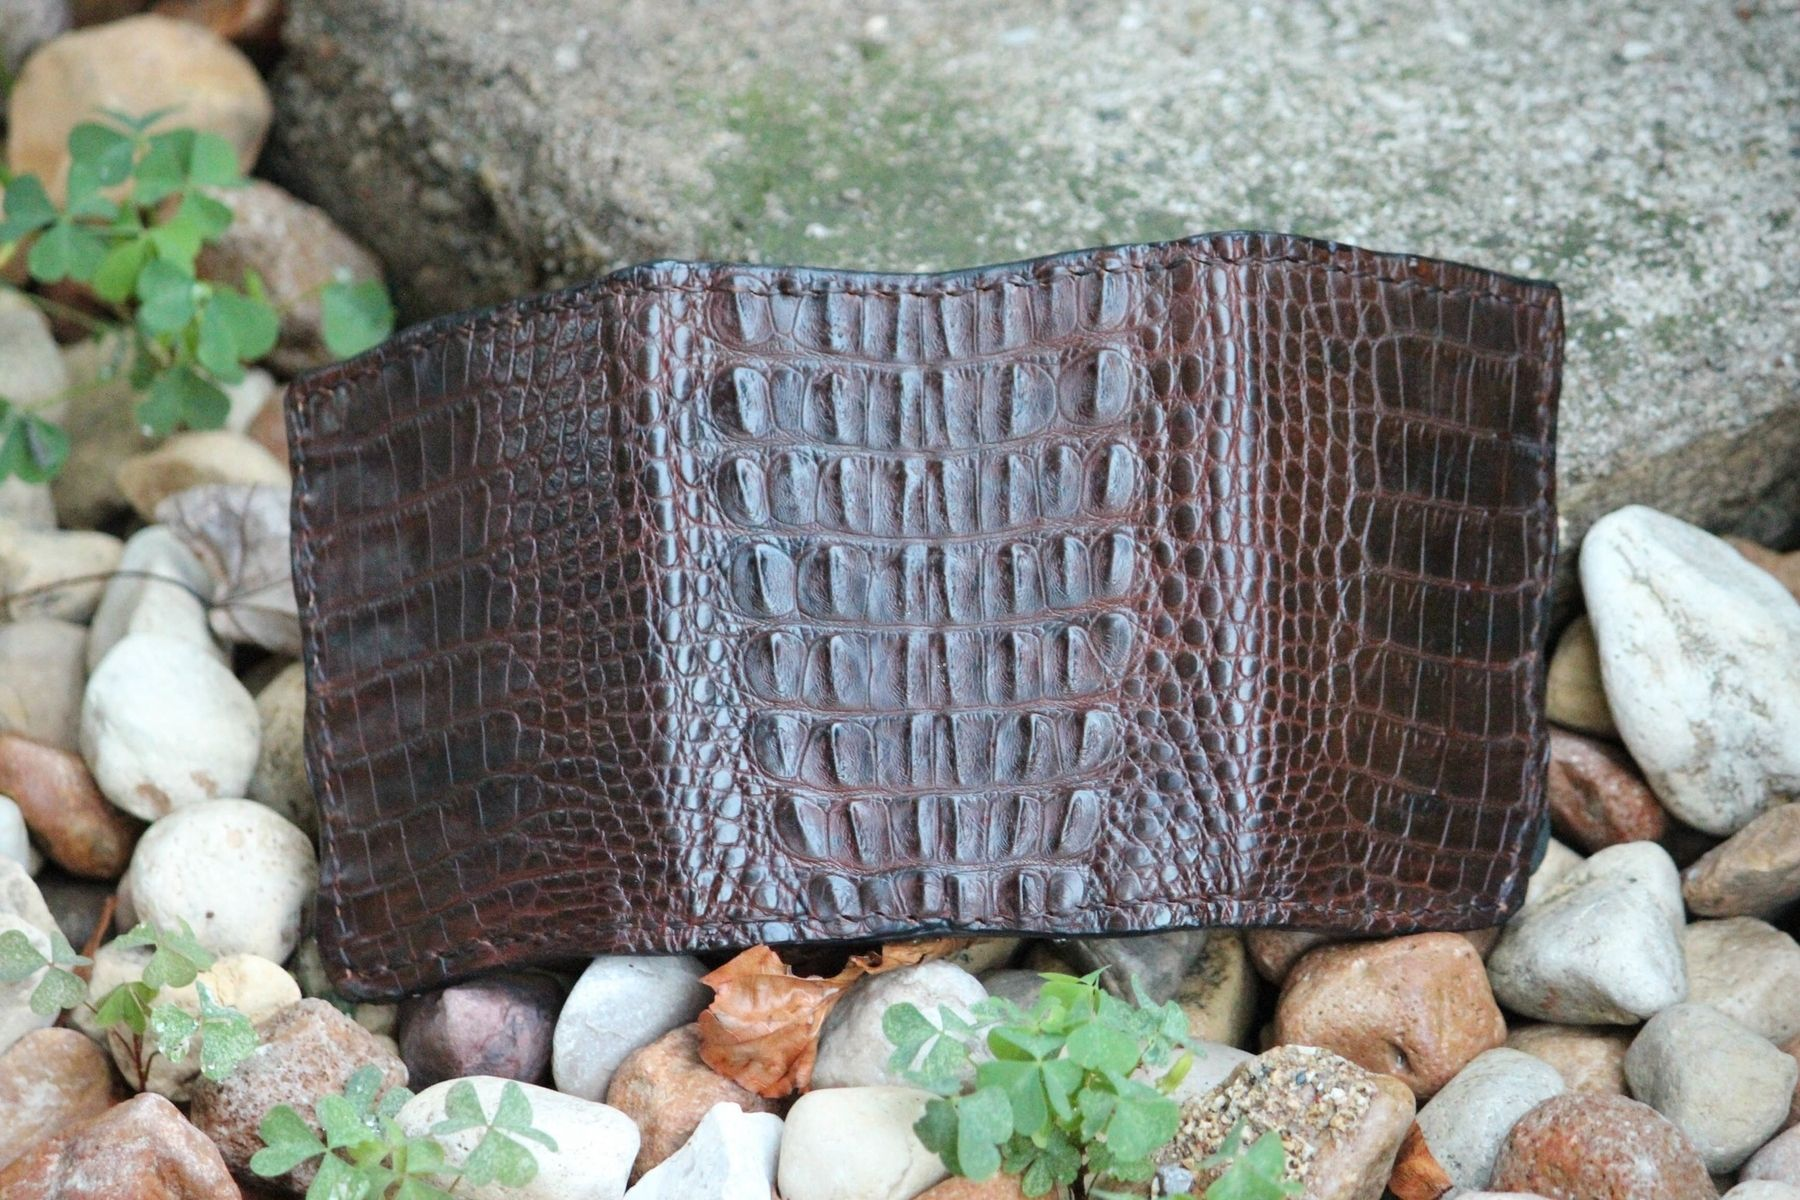 Custom Wallets | Handmade Leather Wallets | CustomMade com